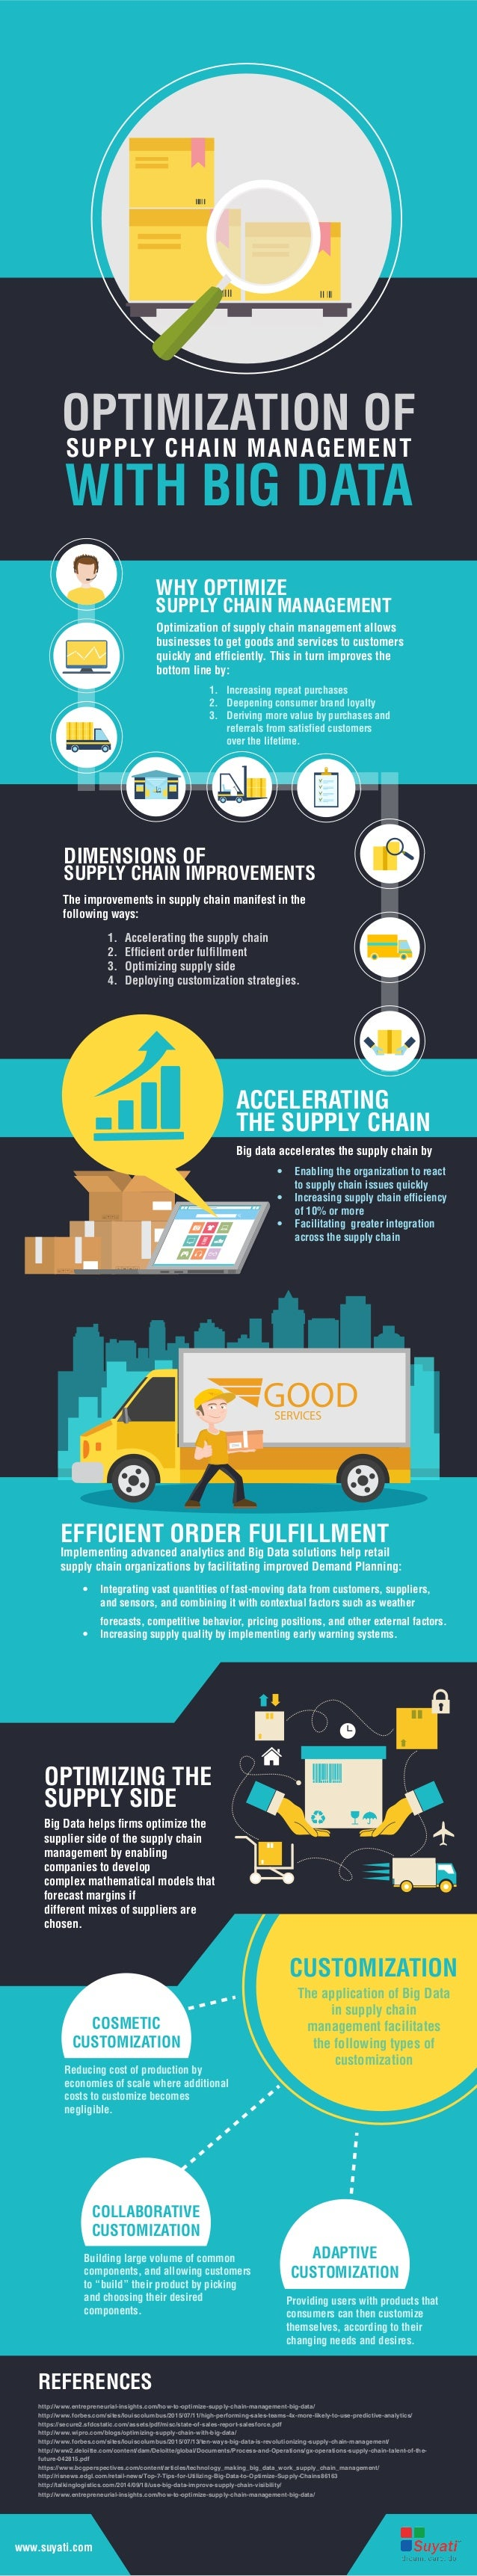 importance of supply chain optimization Evolution,function & importance of supply chain  strategic level strategic network optimization,  function of supply chain evolution of scm supply chain.